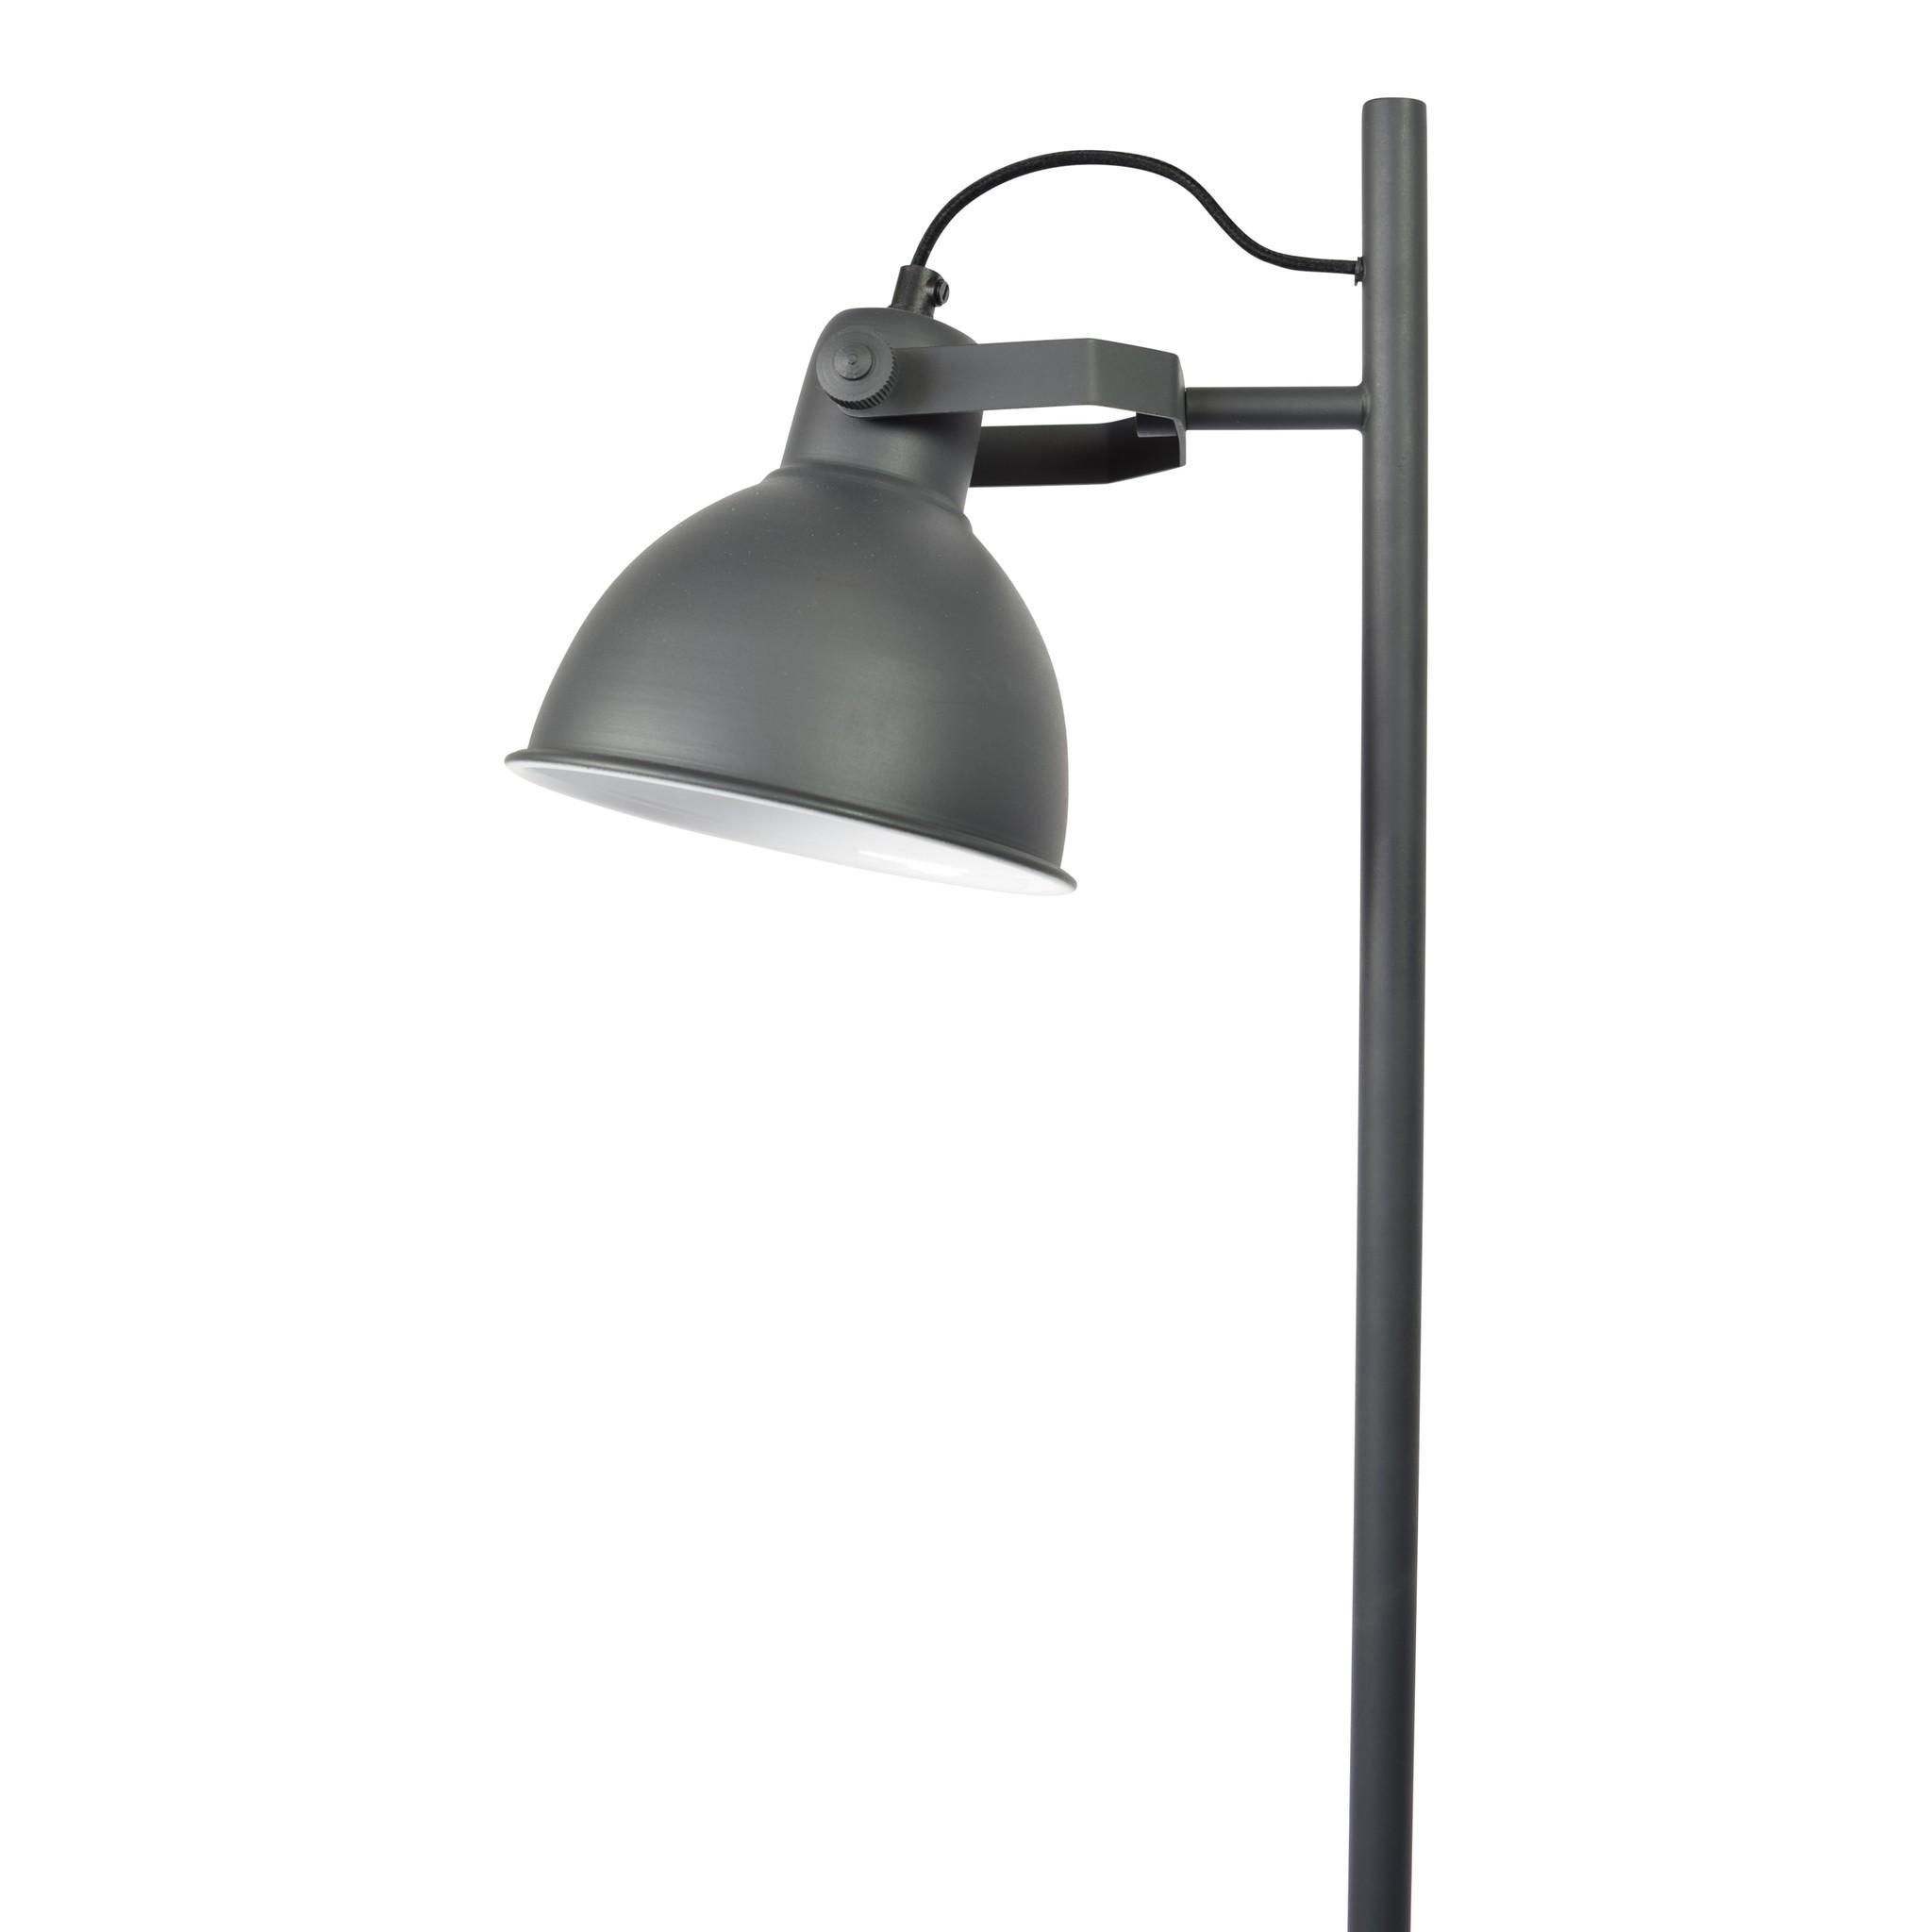 Urban Interiors Urban Interiors Vloerlamp Read vintage black-AI-FL-2224-8719325171402